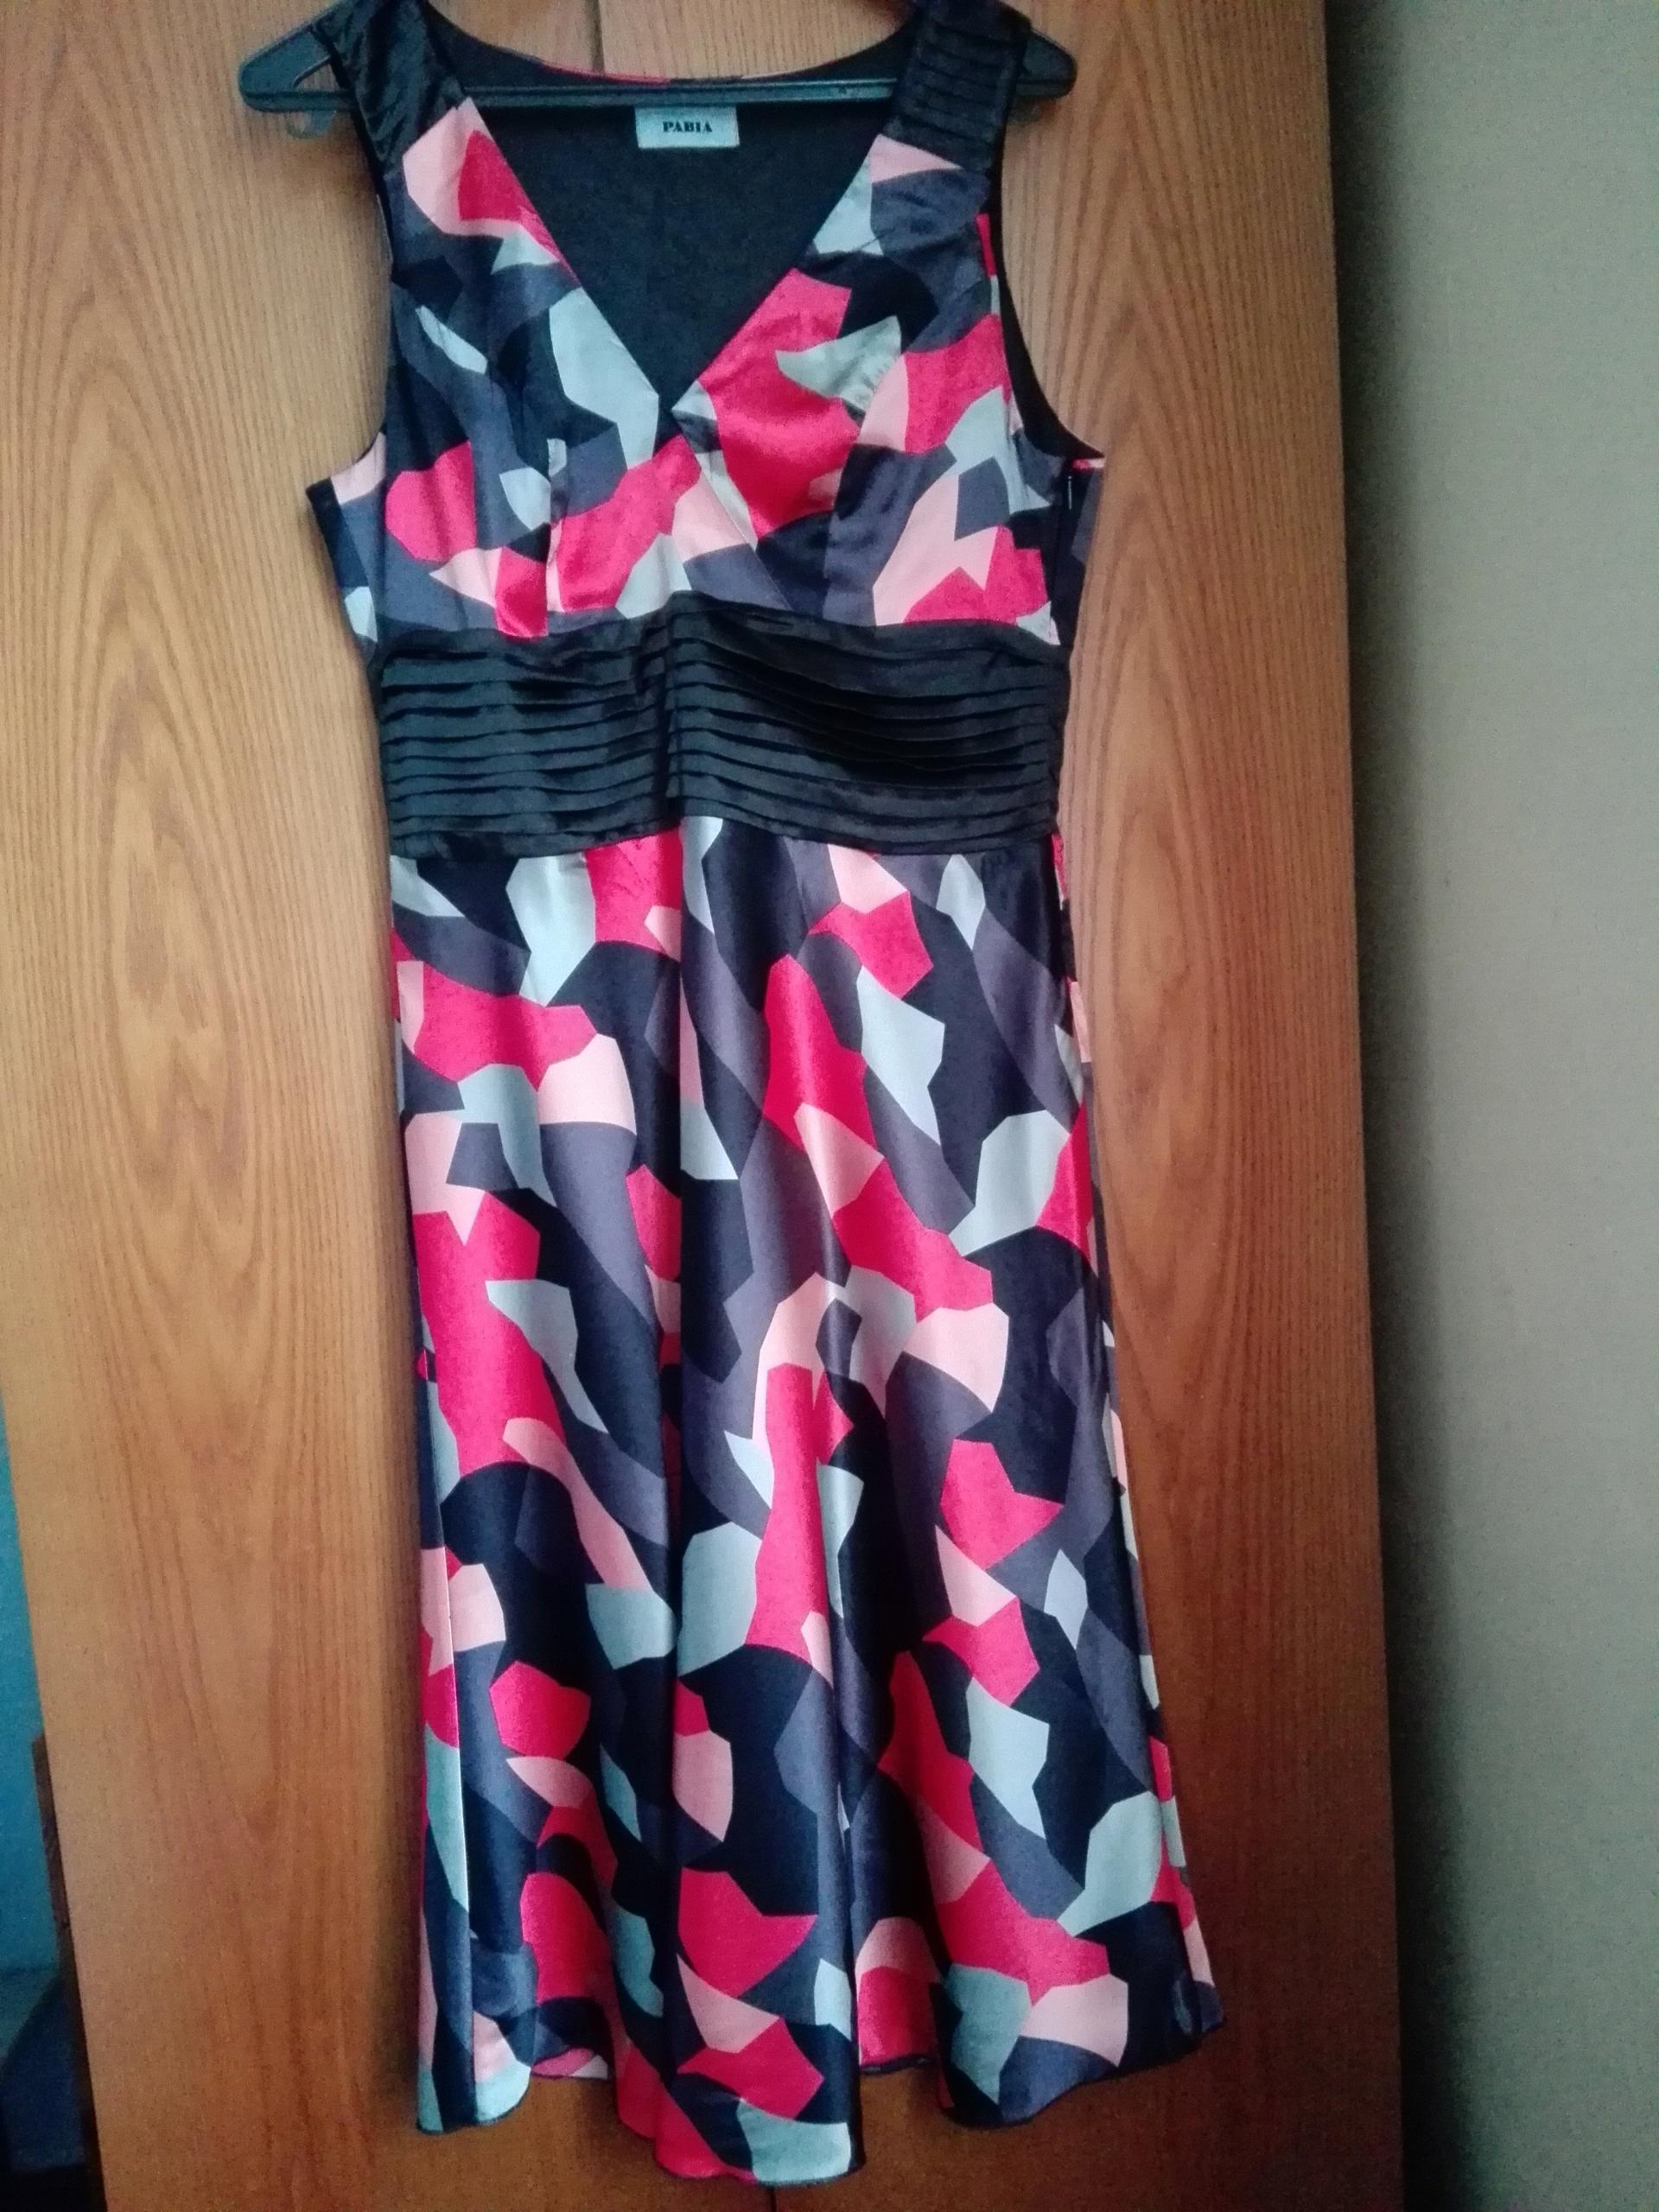 9c2d819135 Sukienka PABIA r. 44 - 7471103745 - oficjalne archiwum allegro